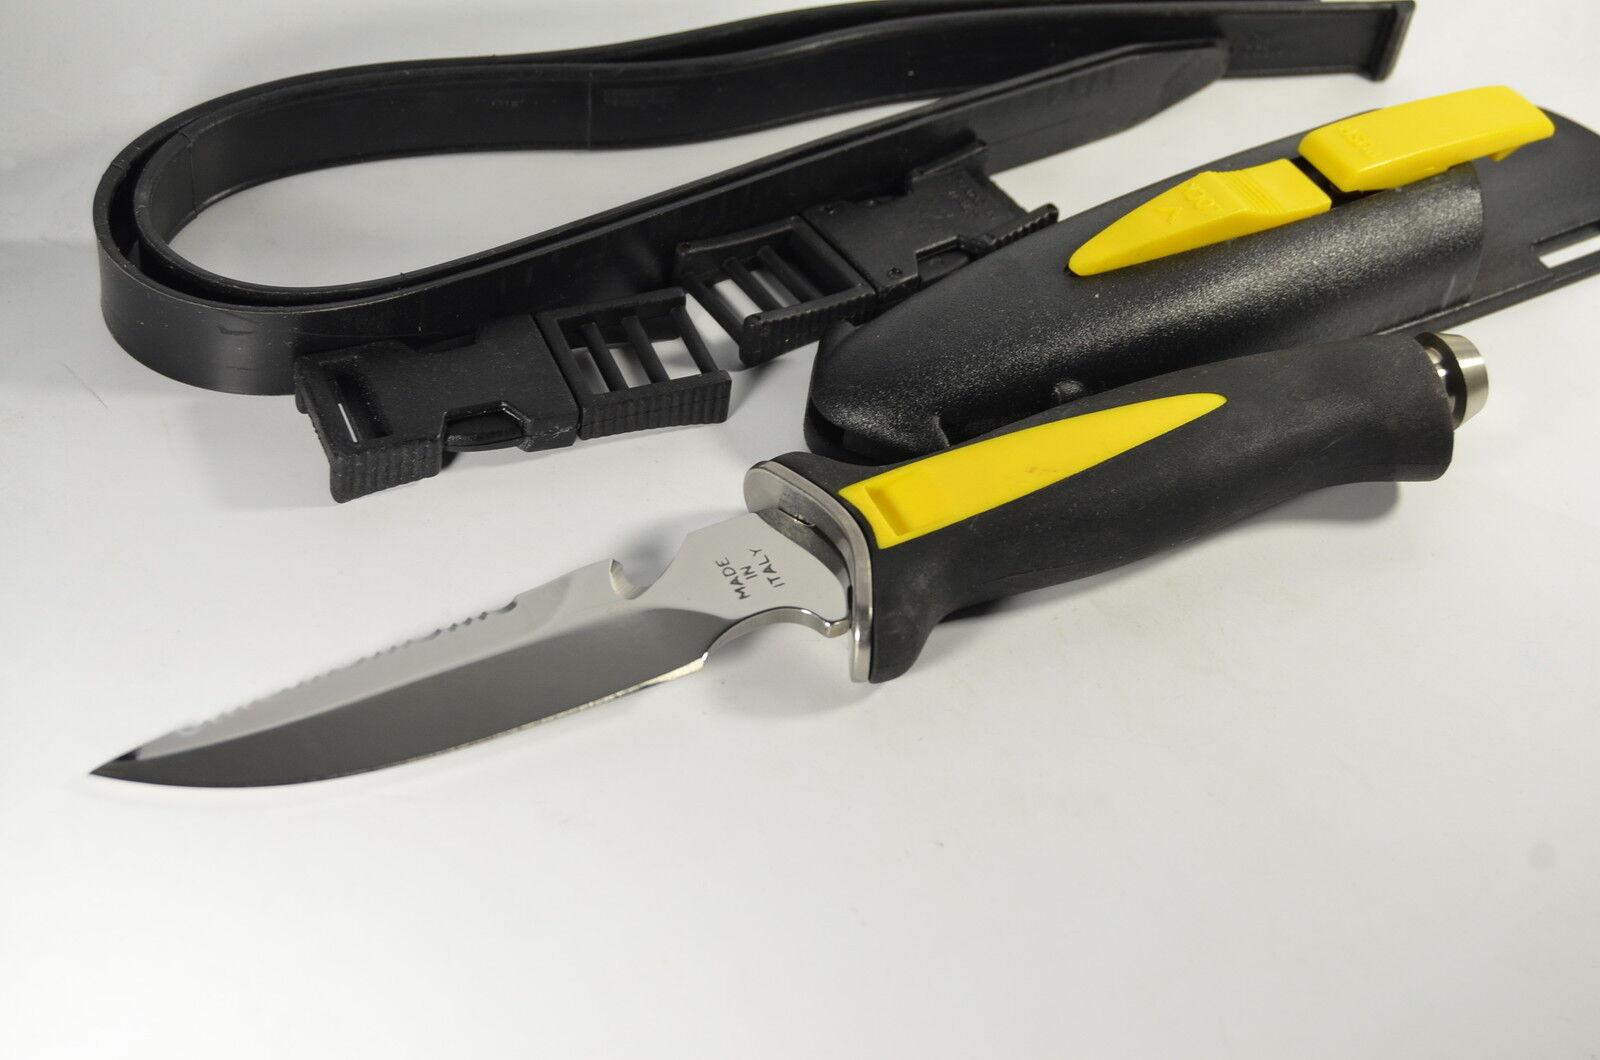 MAC MAC MAC Coltellerie Aquatys Tauchermesser EDC Messer Maniago Italien Gelb 3a62e9